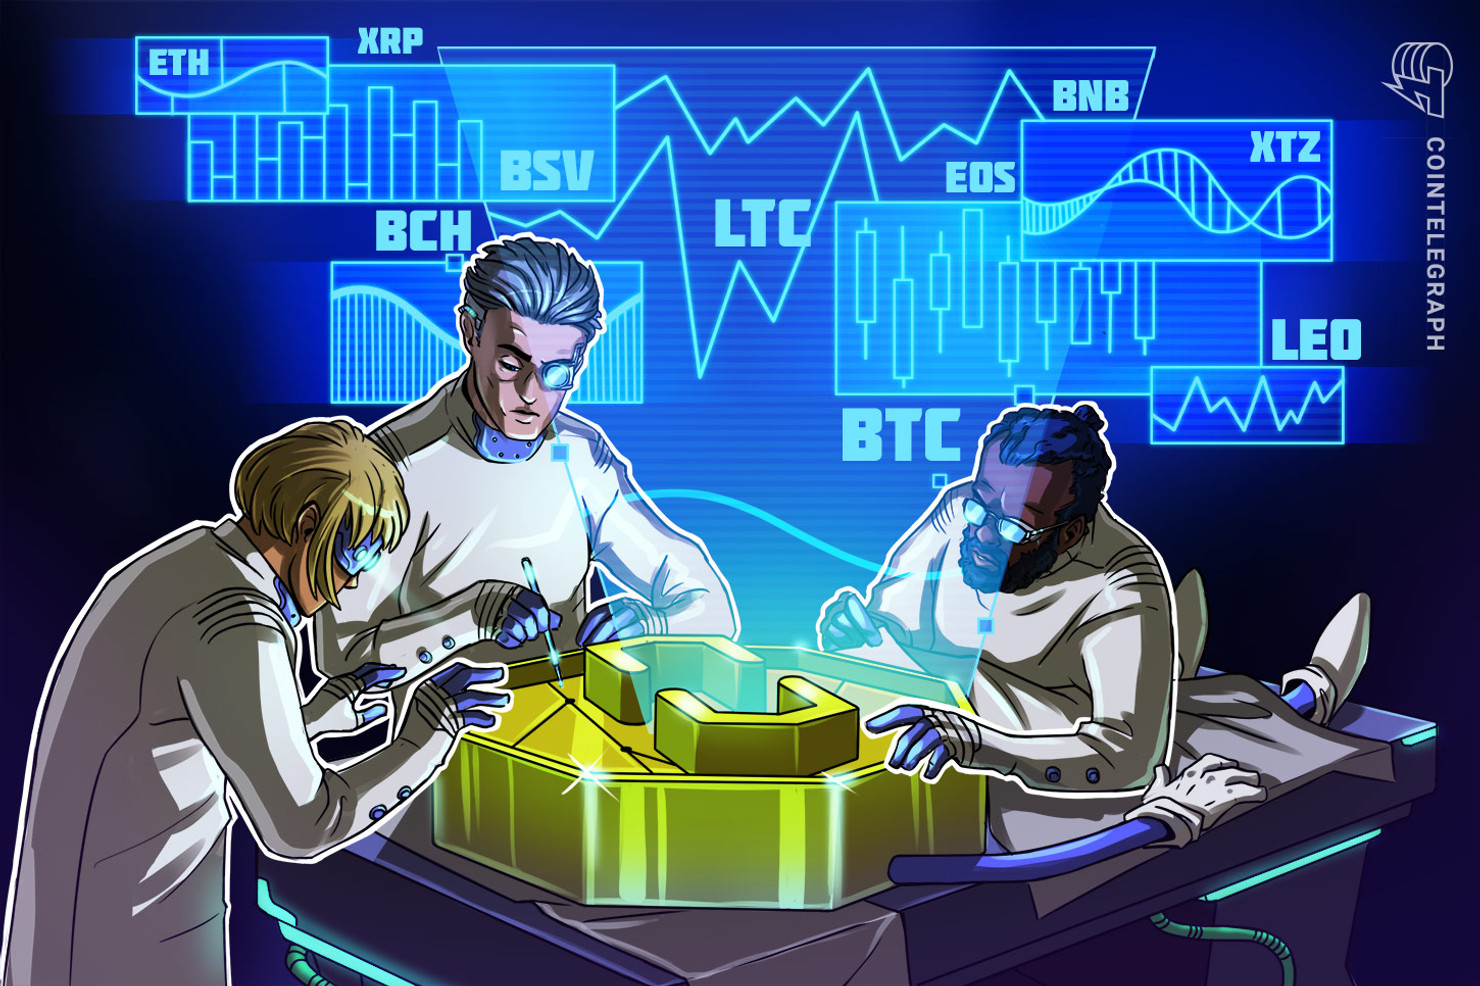 Price Analysis Mar 20: BTC, ETH, XRP, BCH, BSV, LTC, EOS, BNB, XTZ, LEO